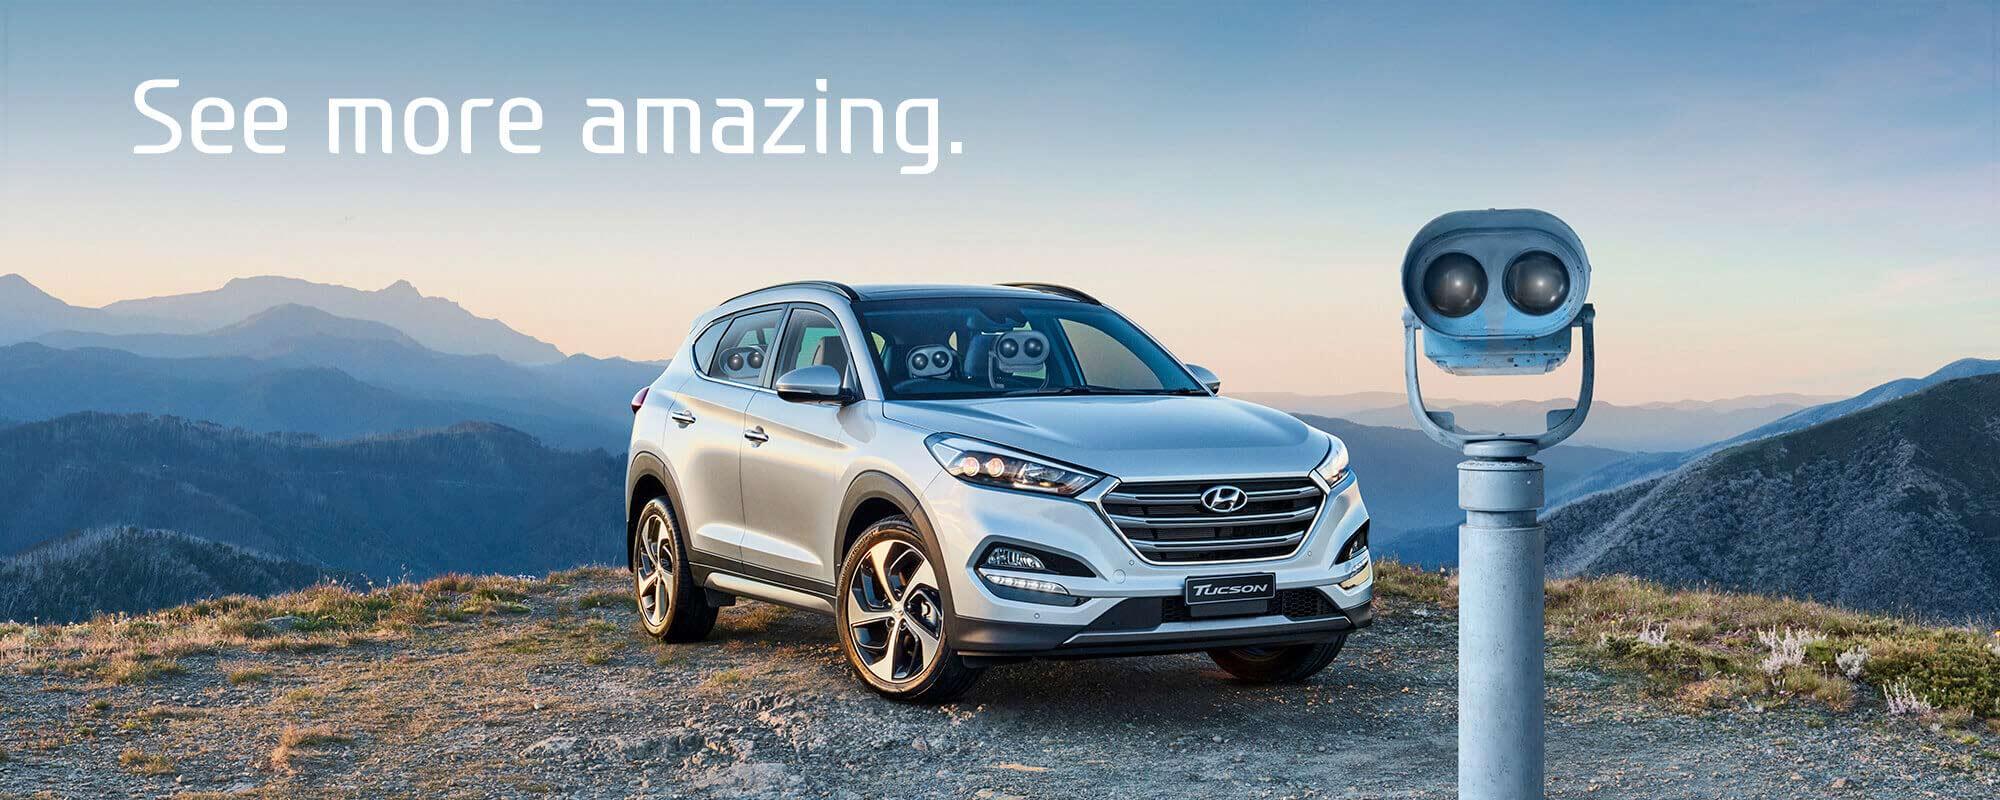 See more amazing with the all new Hyundai Tucson at Metro Hyundai.